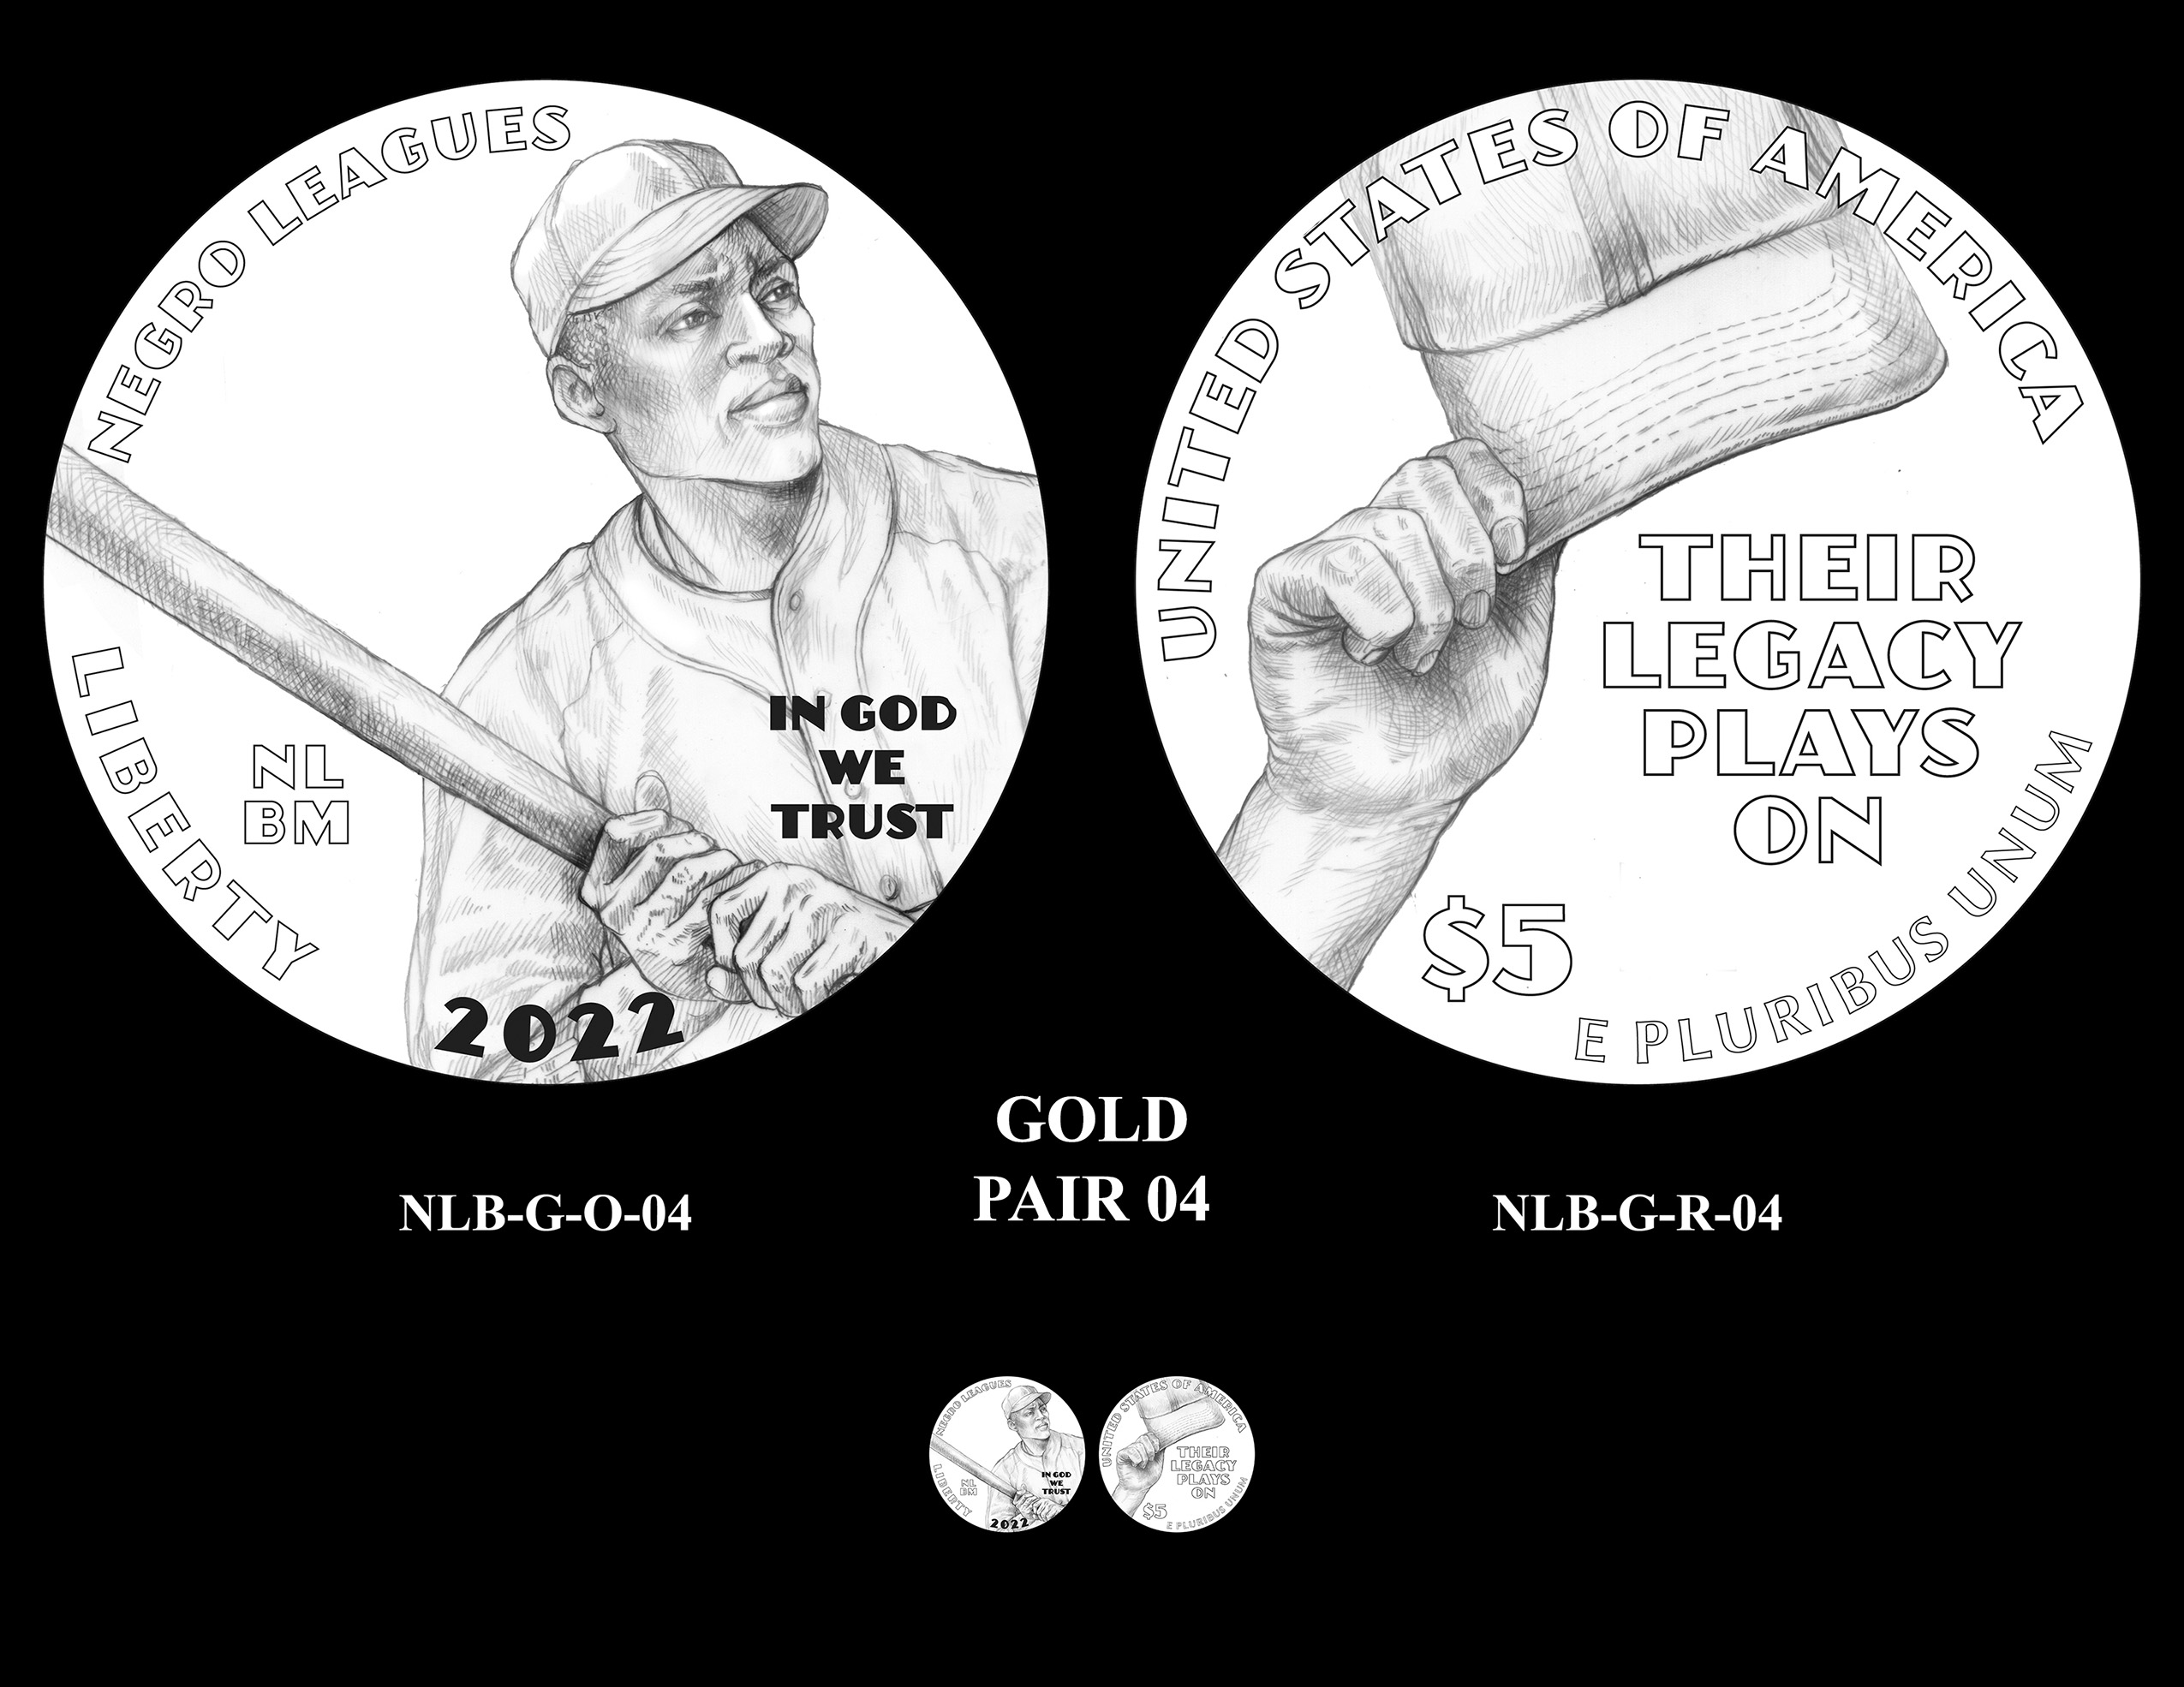 Gold Pair 04 -- Negro Leagues Baseball Commemorative Coin Program